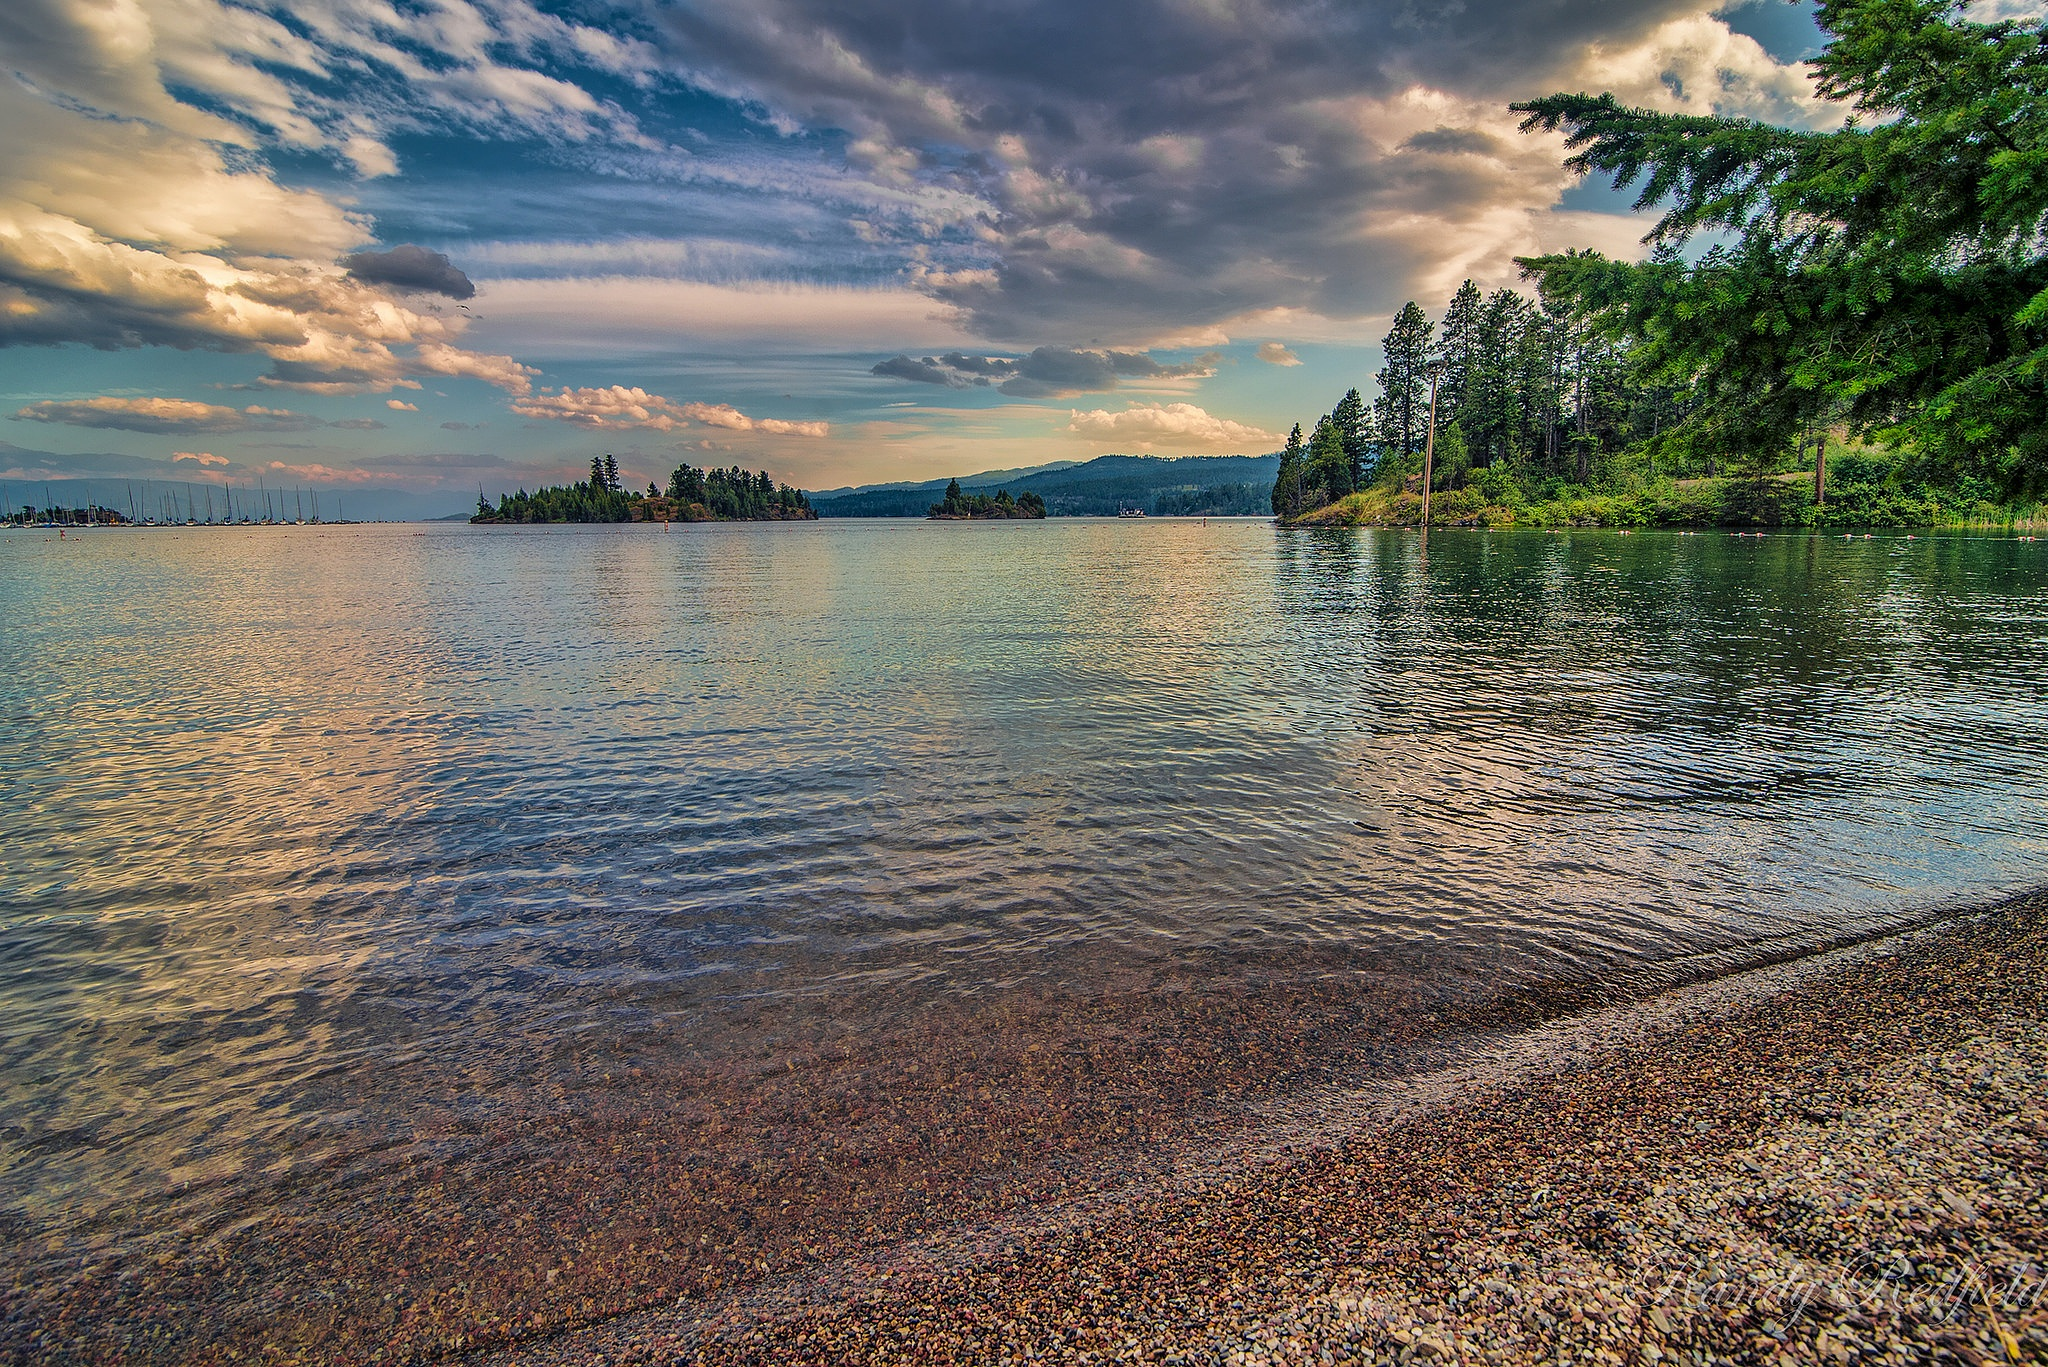 Flathead lake, Montana by Randy Redfield